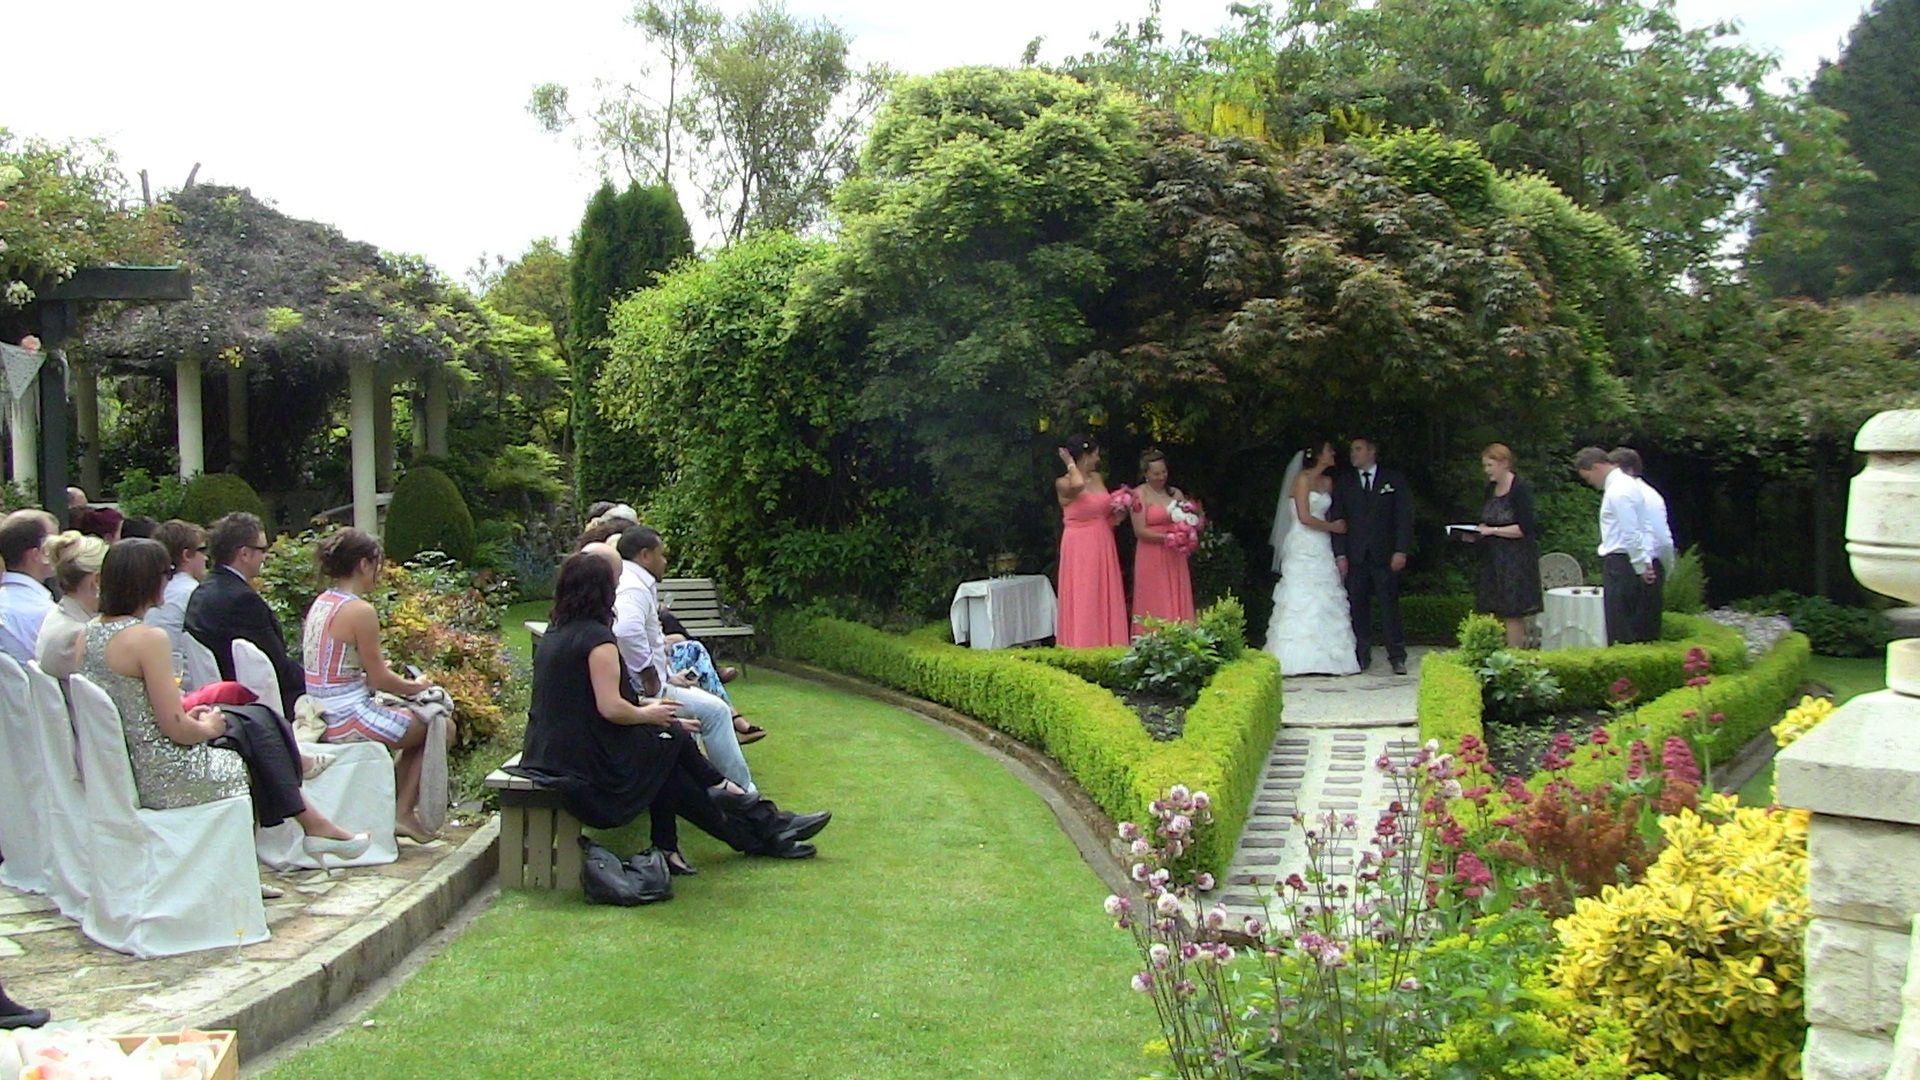 A November Wedding At Parkside Gardens, Oamaru, South Island NZ